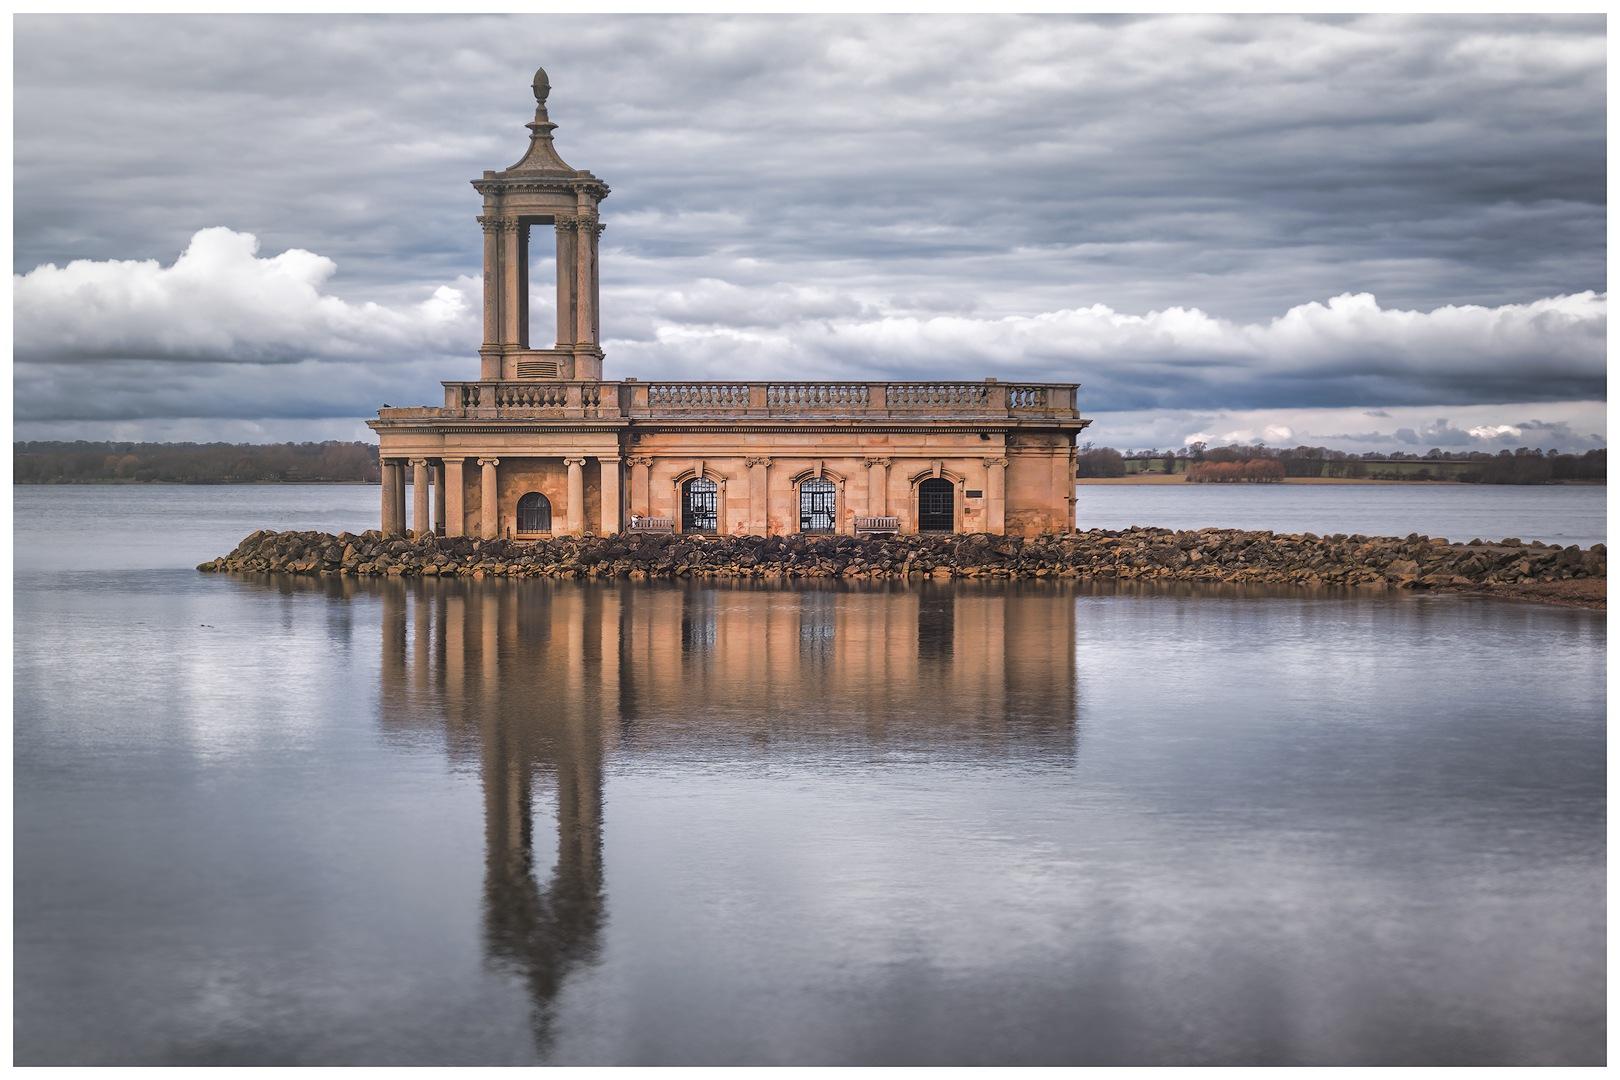 Normanton Church, Rutland by Purple128